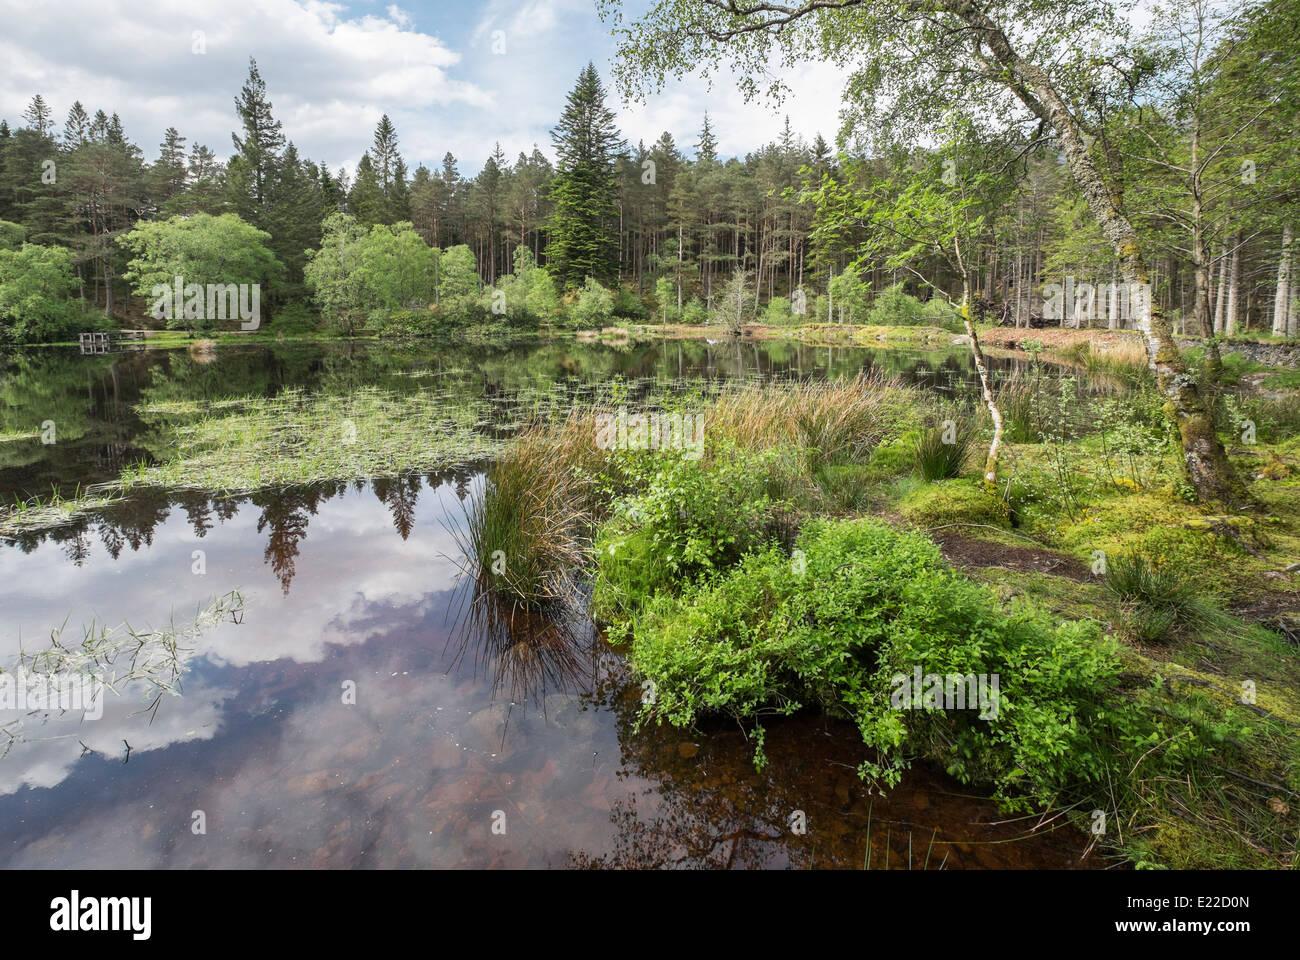 Glencoe Lochan freshwater loch in Forestry Commission woodland. Glencoe, Highland, Scotland, UK, Britain - Stock Image